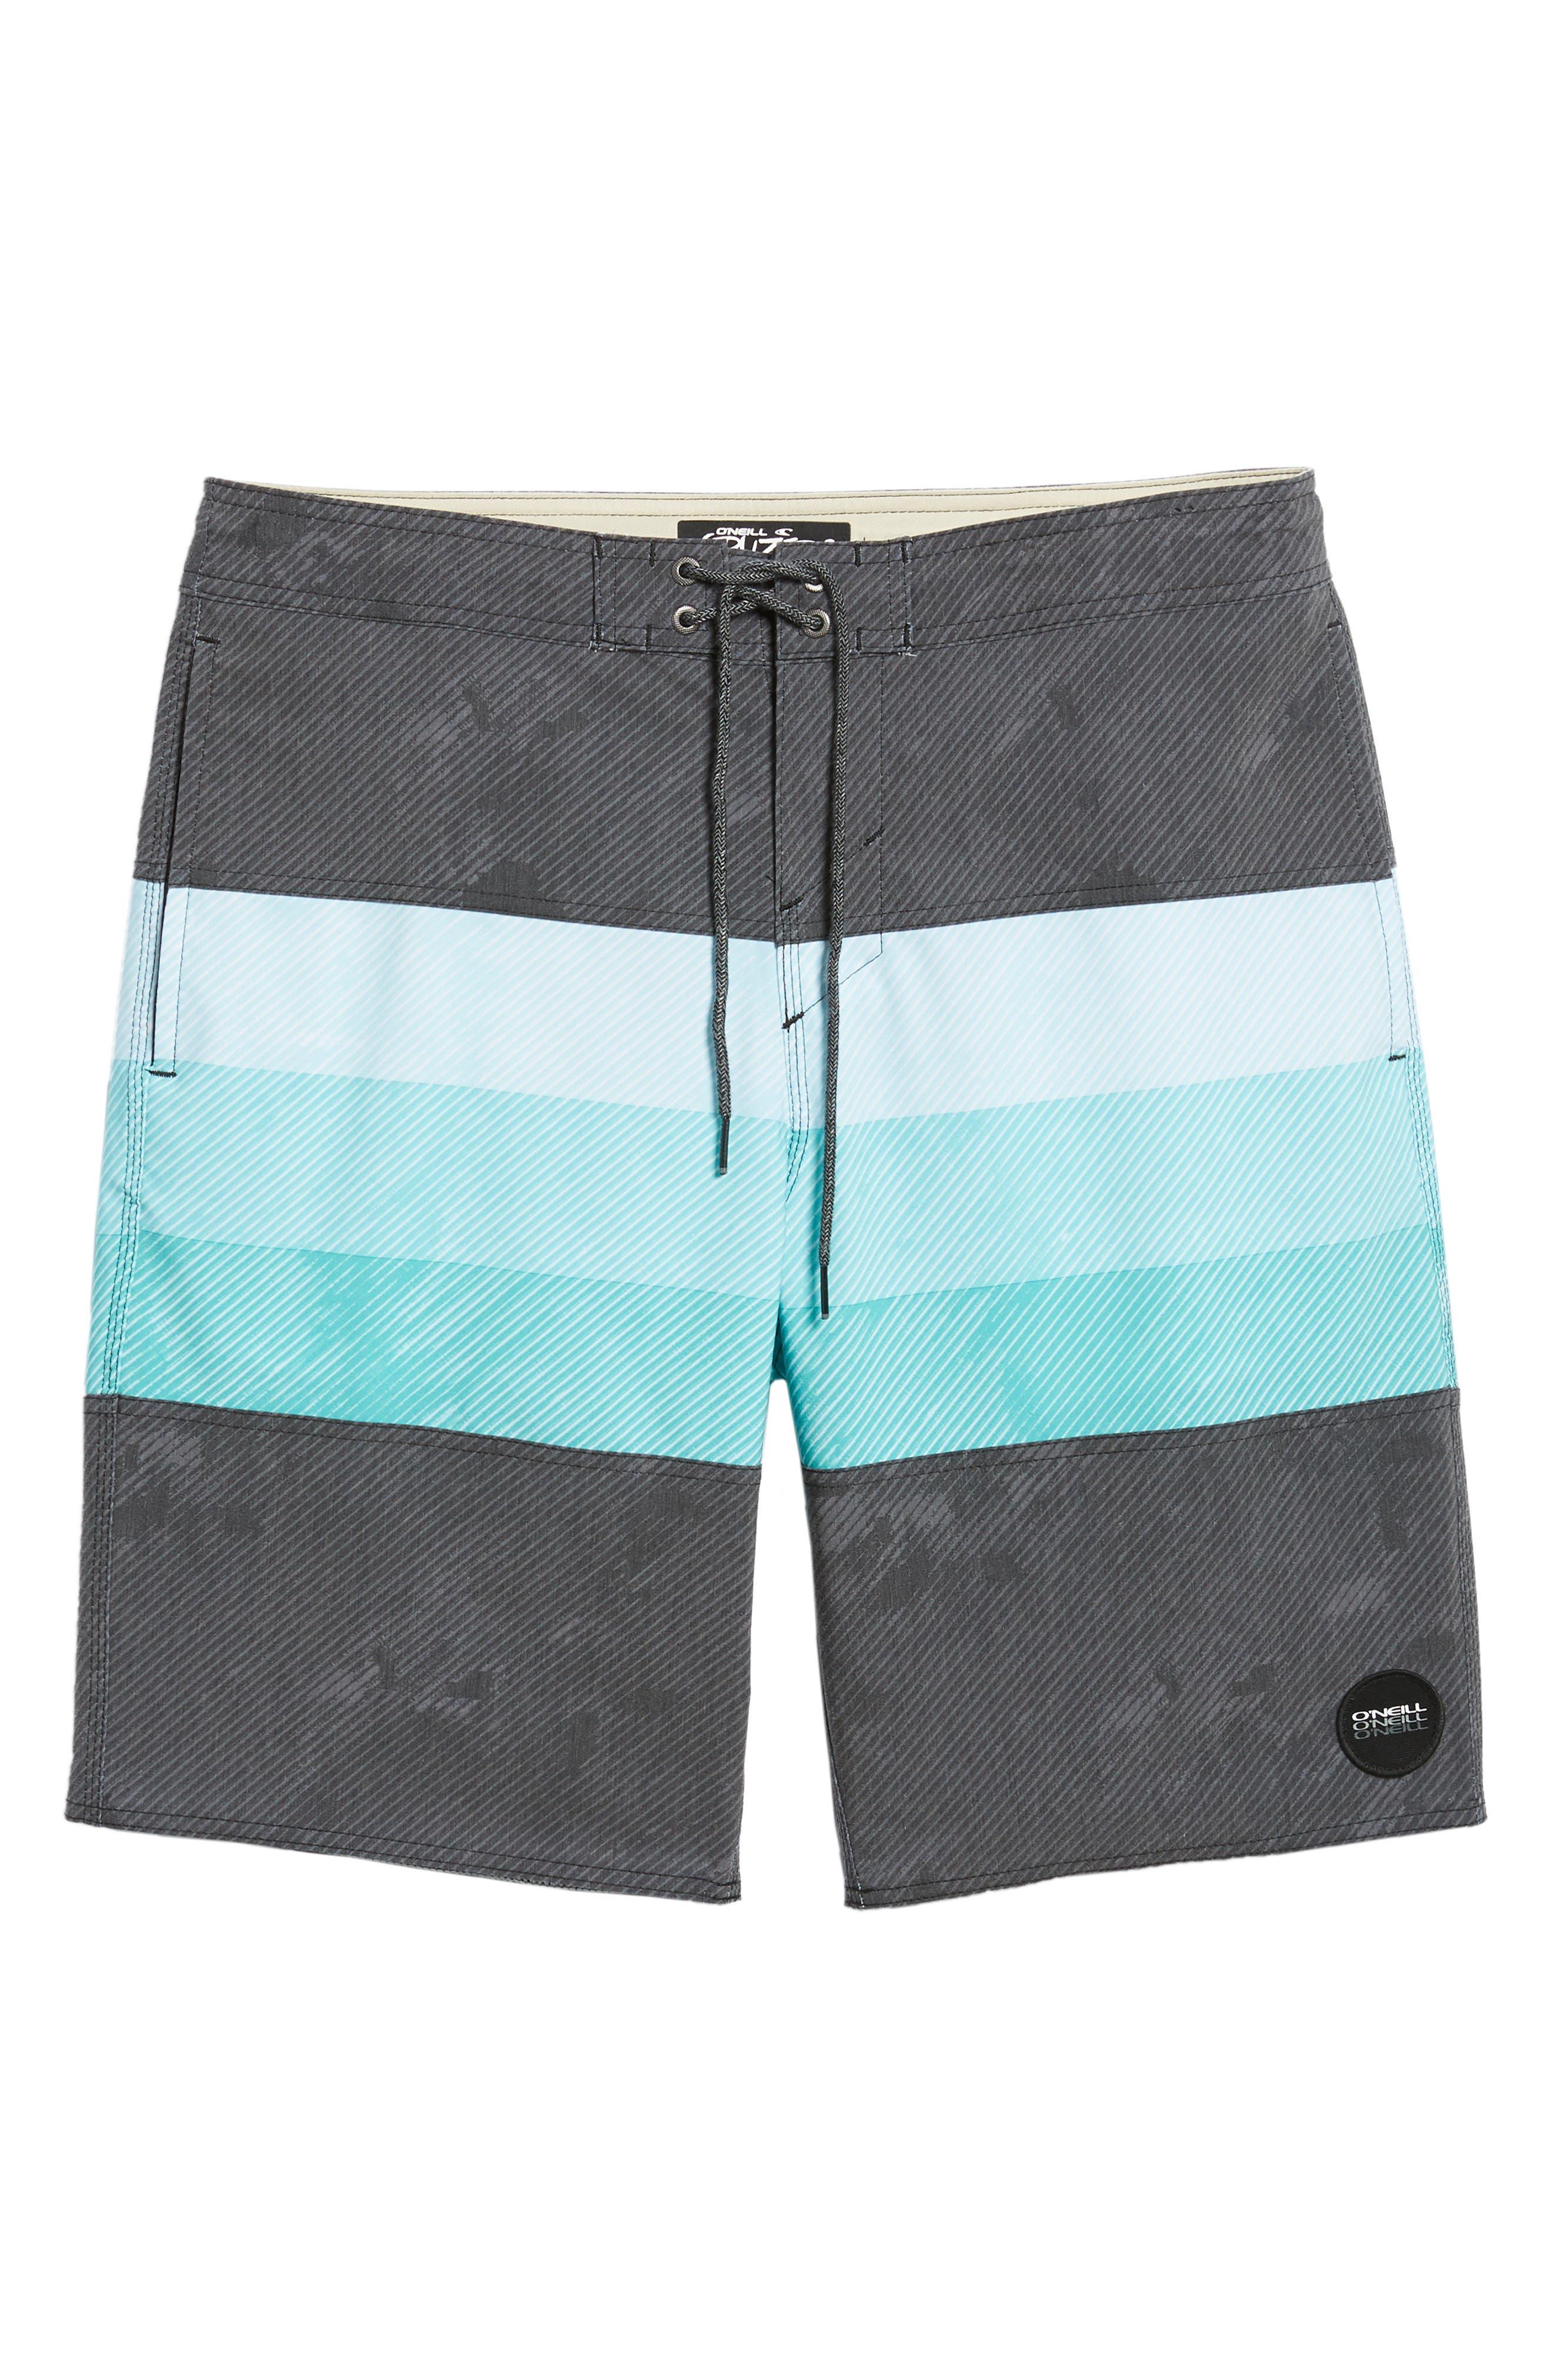 Region Cruzer Board Shorts,                             Alternate thumbnail 6, color,